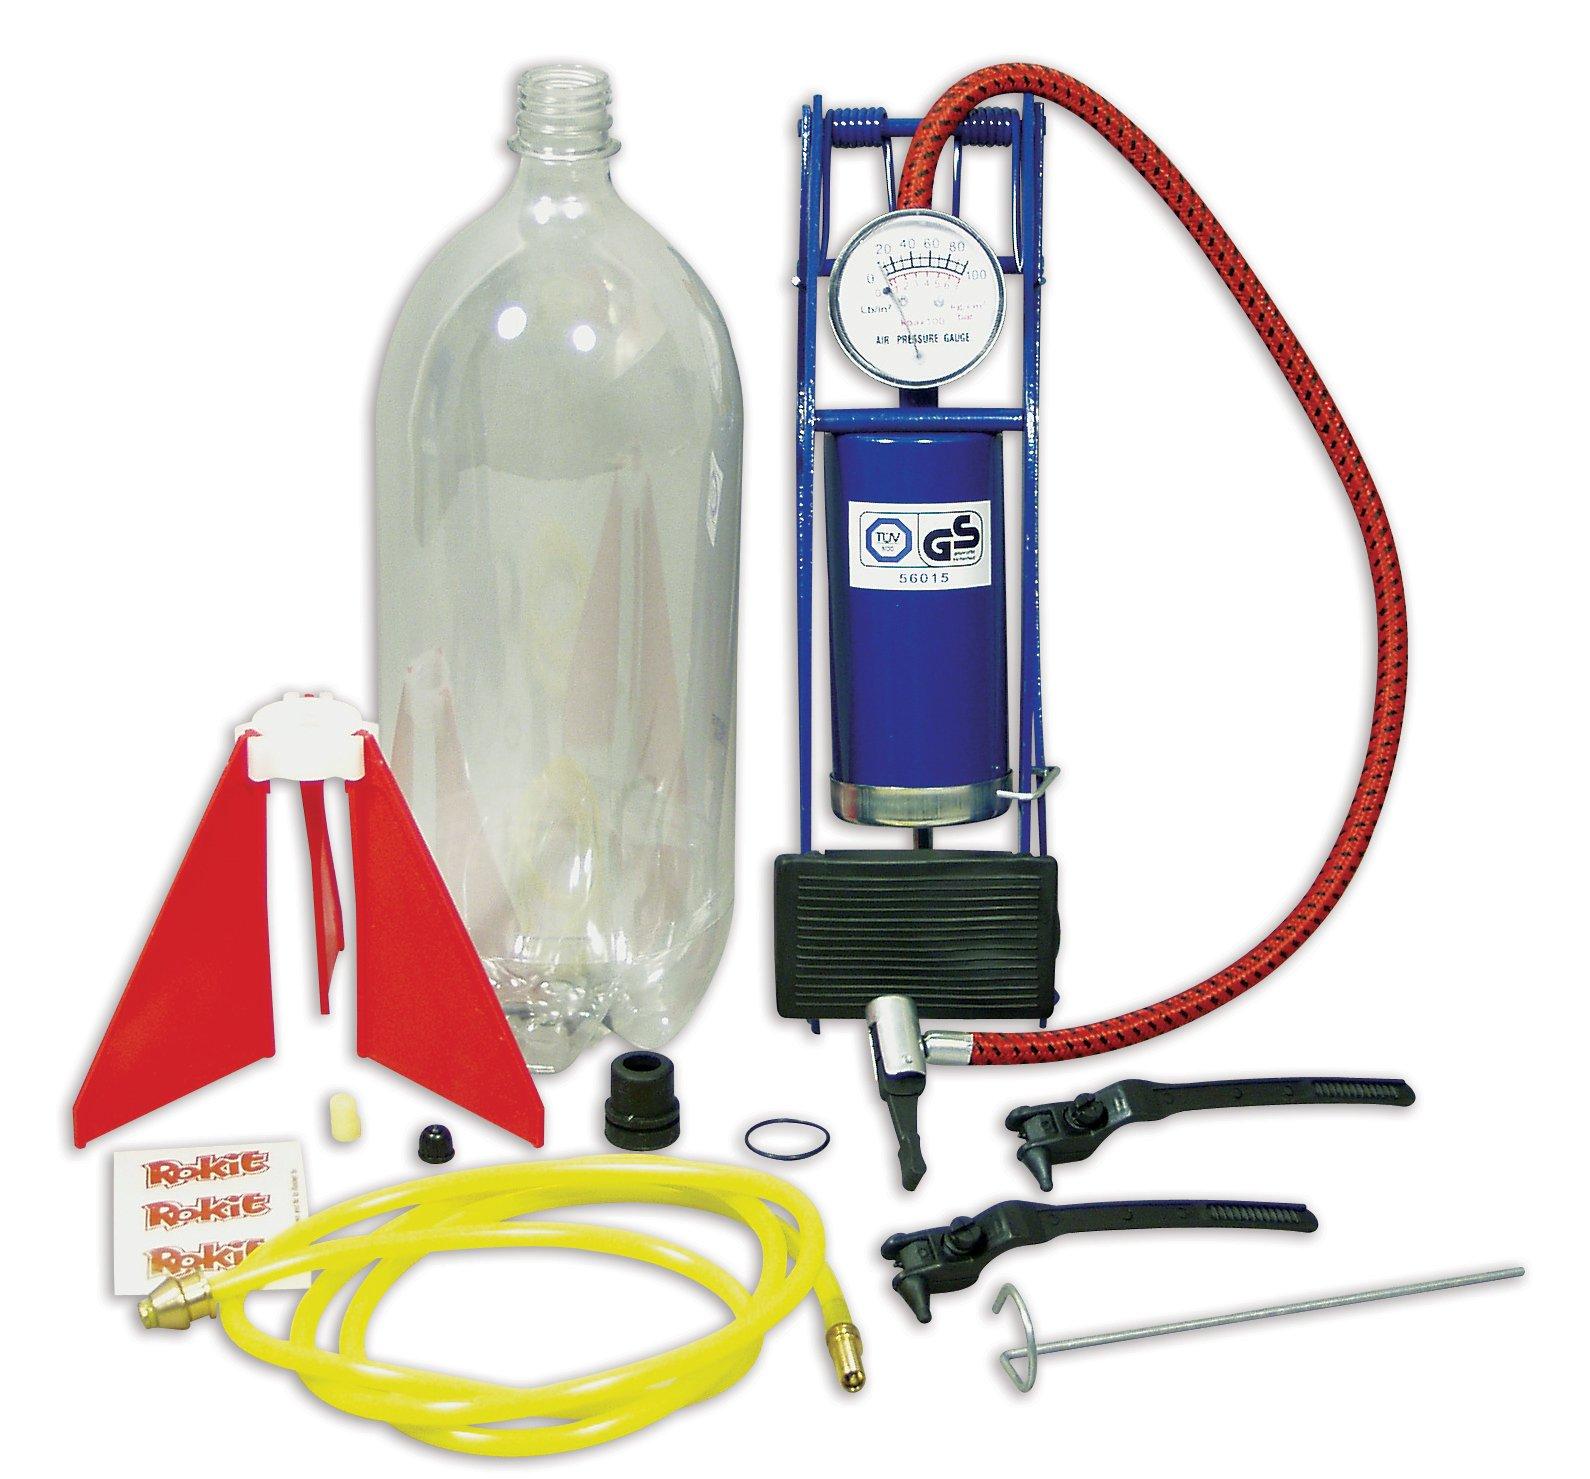 Delta Education Bottle Rokit Science Kit,110-1209